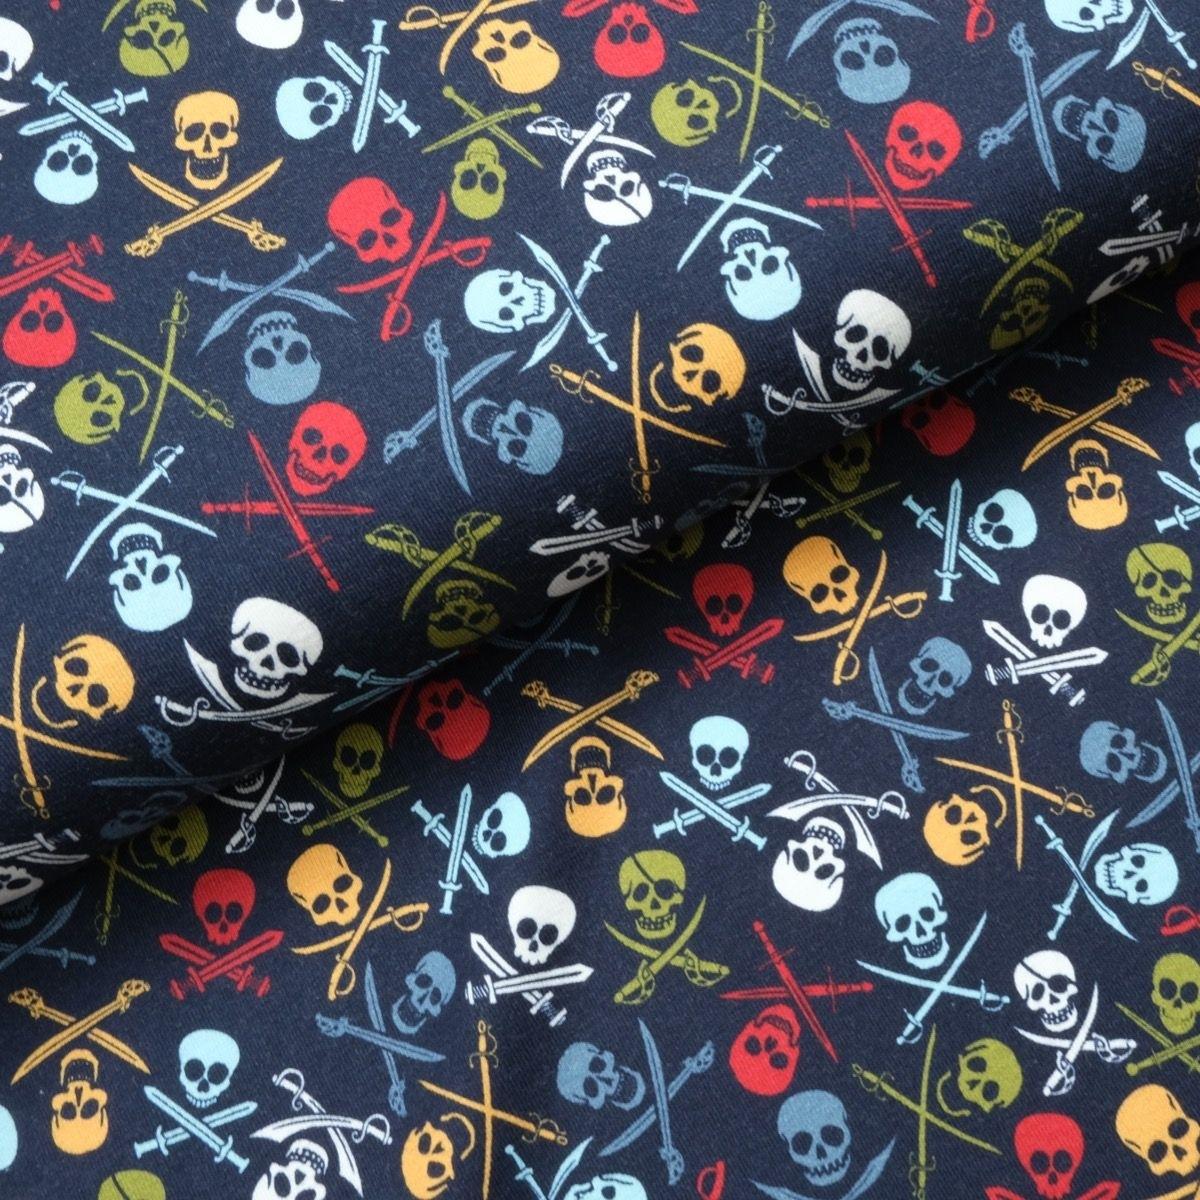 Baumwolljersey - Jersey Stoff - Motivjersey - Totenköpfe auf Navy